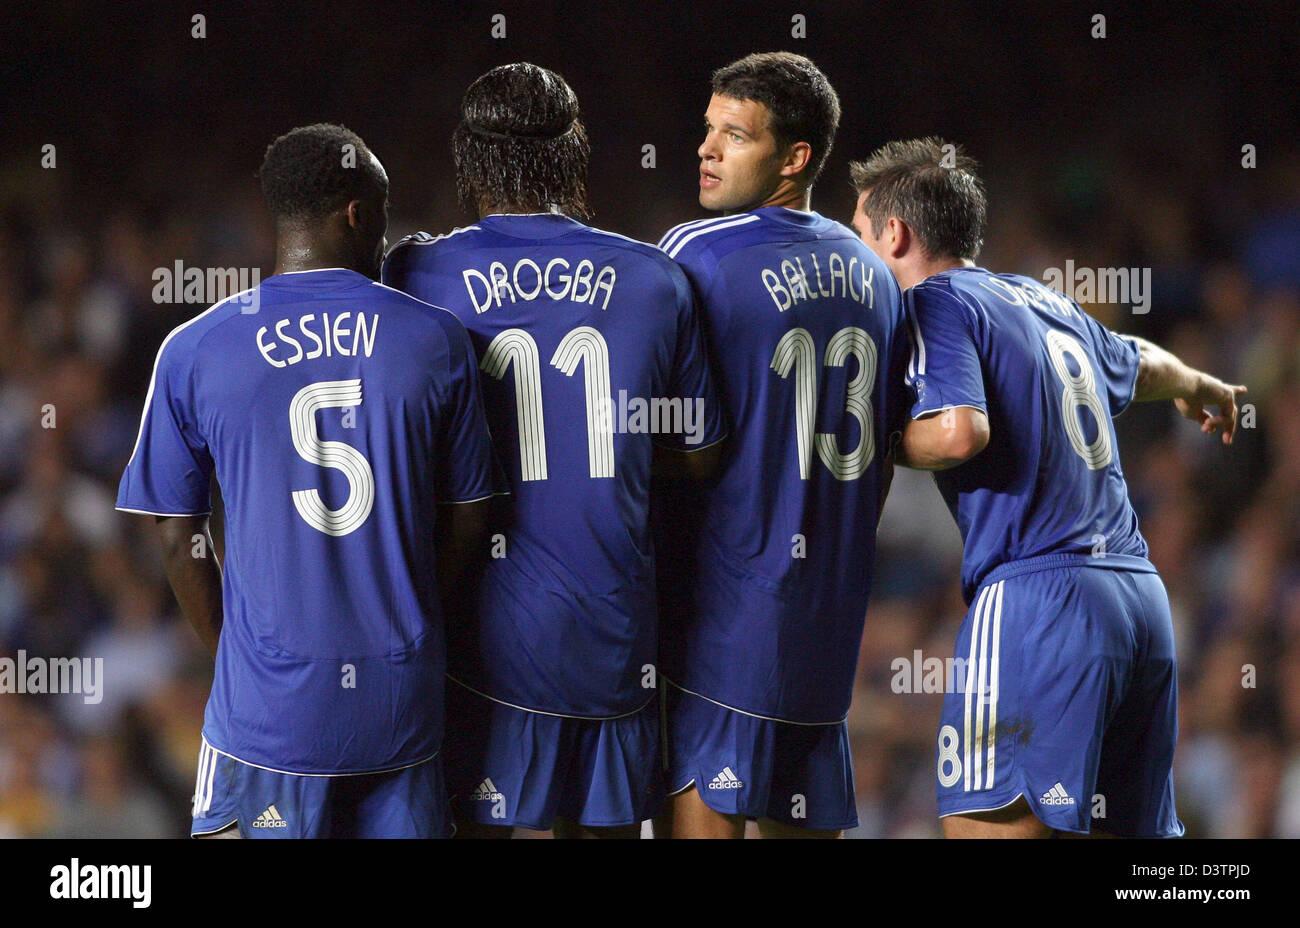 huge selection of 8a2ef 4e792 Chelsea players (L-R) Michael Essien, Didier Drogba, Michael ...